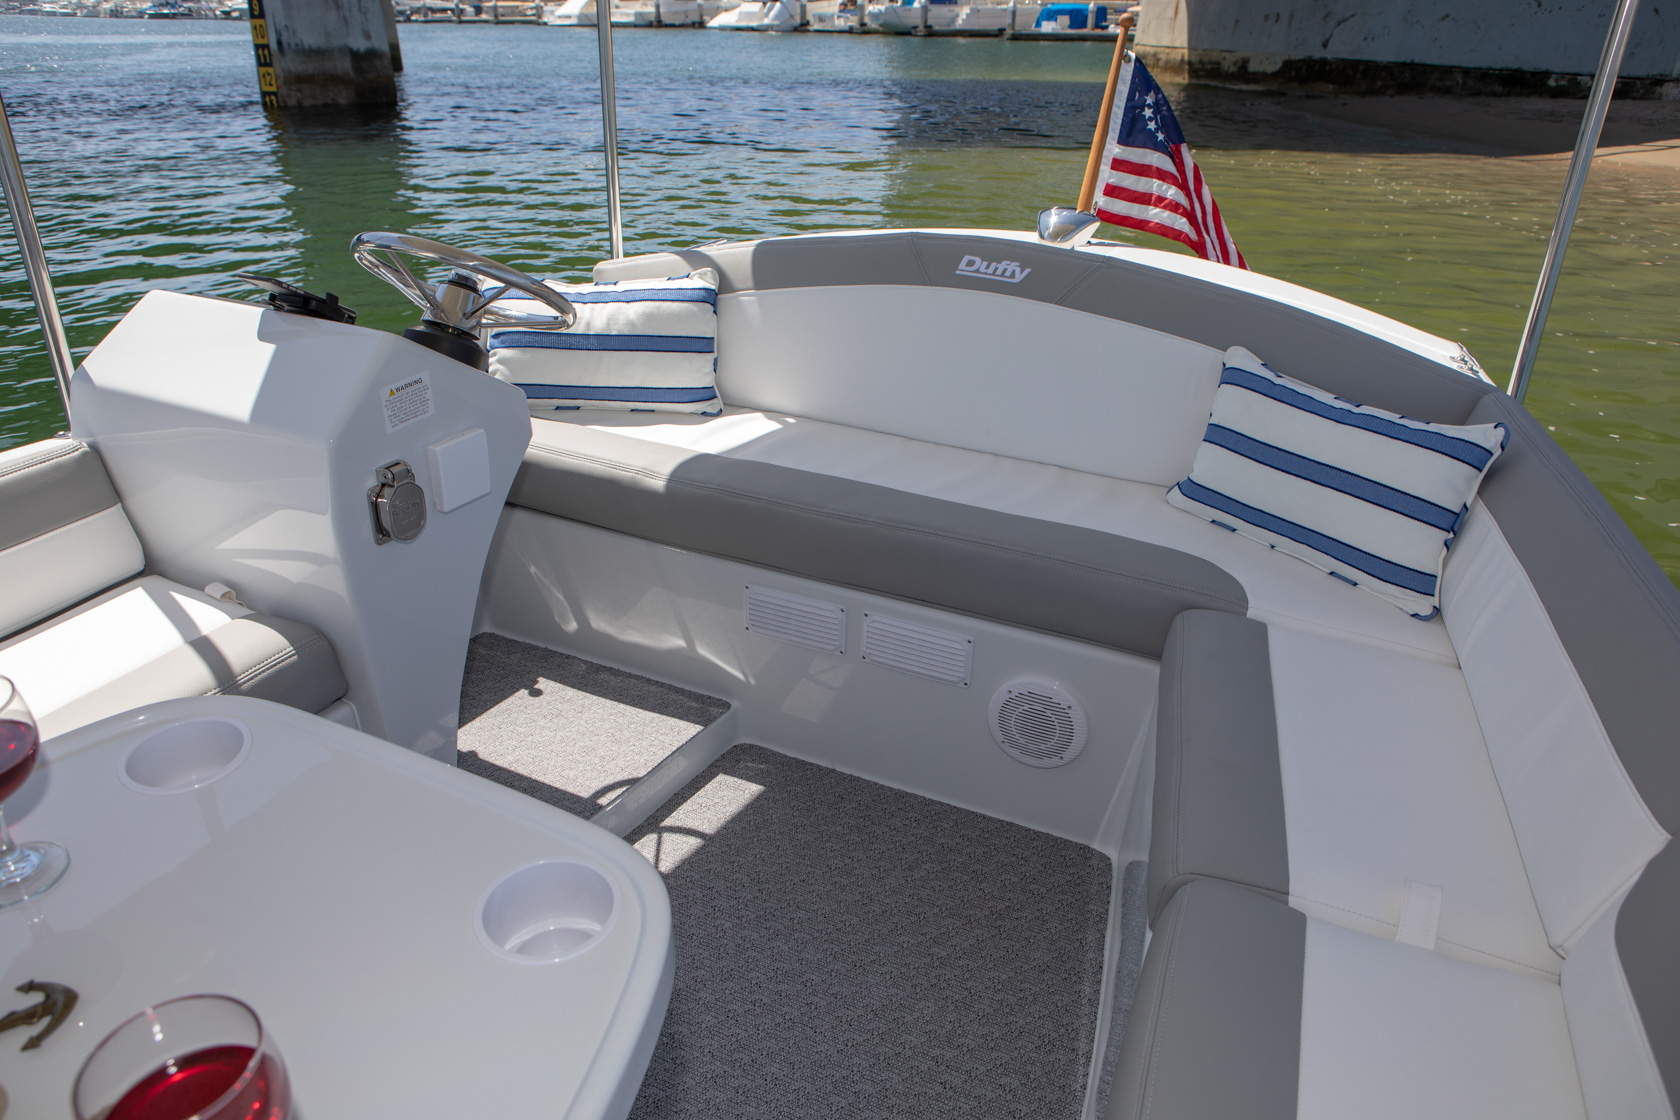 Duffy-Electric-Boats-Bayshore-18-Interior-v2-6